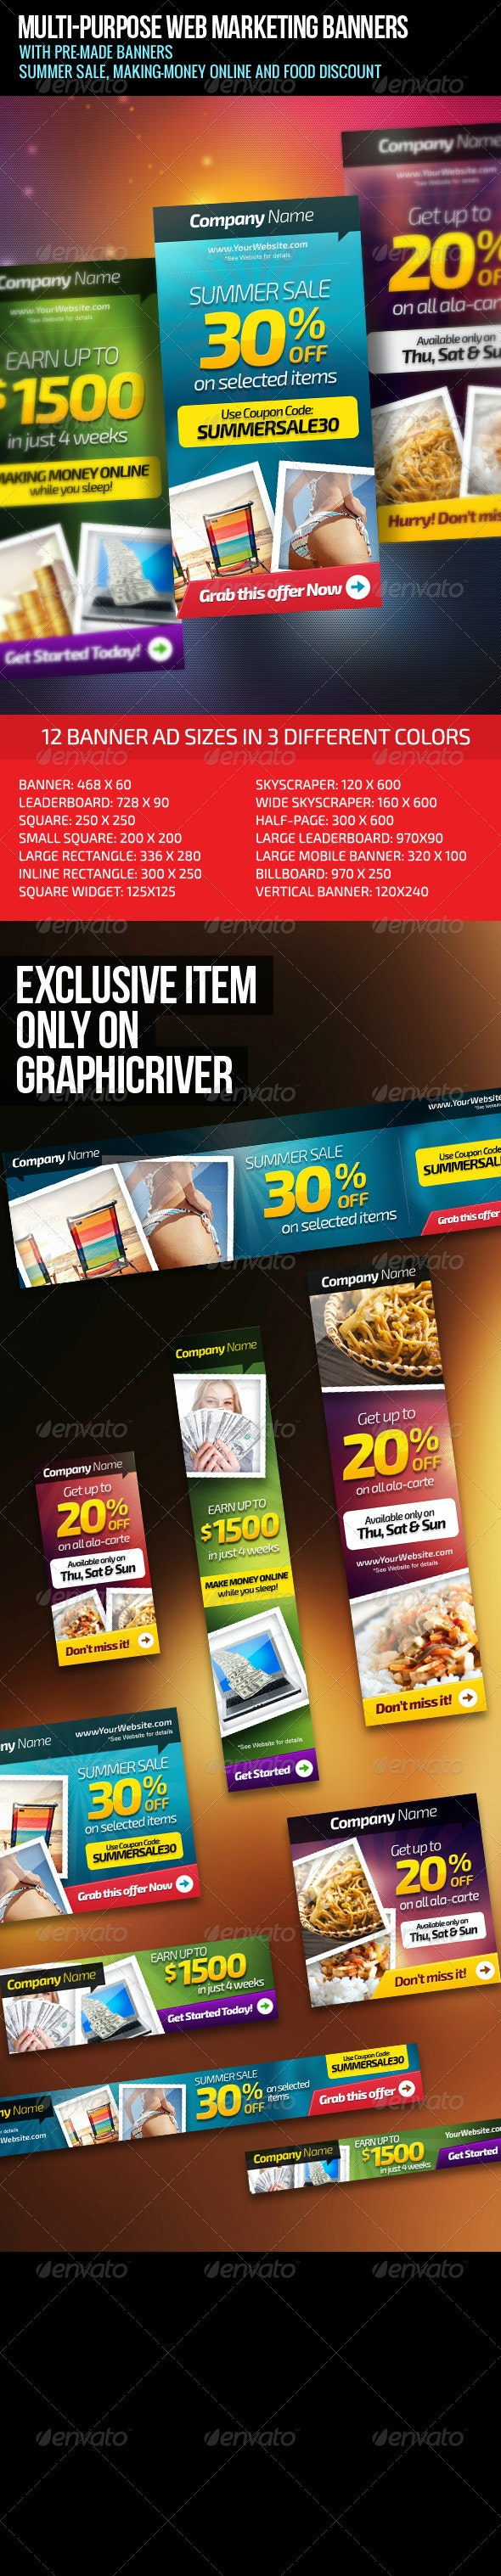 Multi-Purpose Web Marketing Banners - Banners & Ads Web Elements